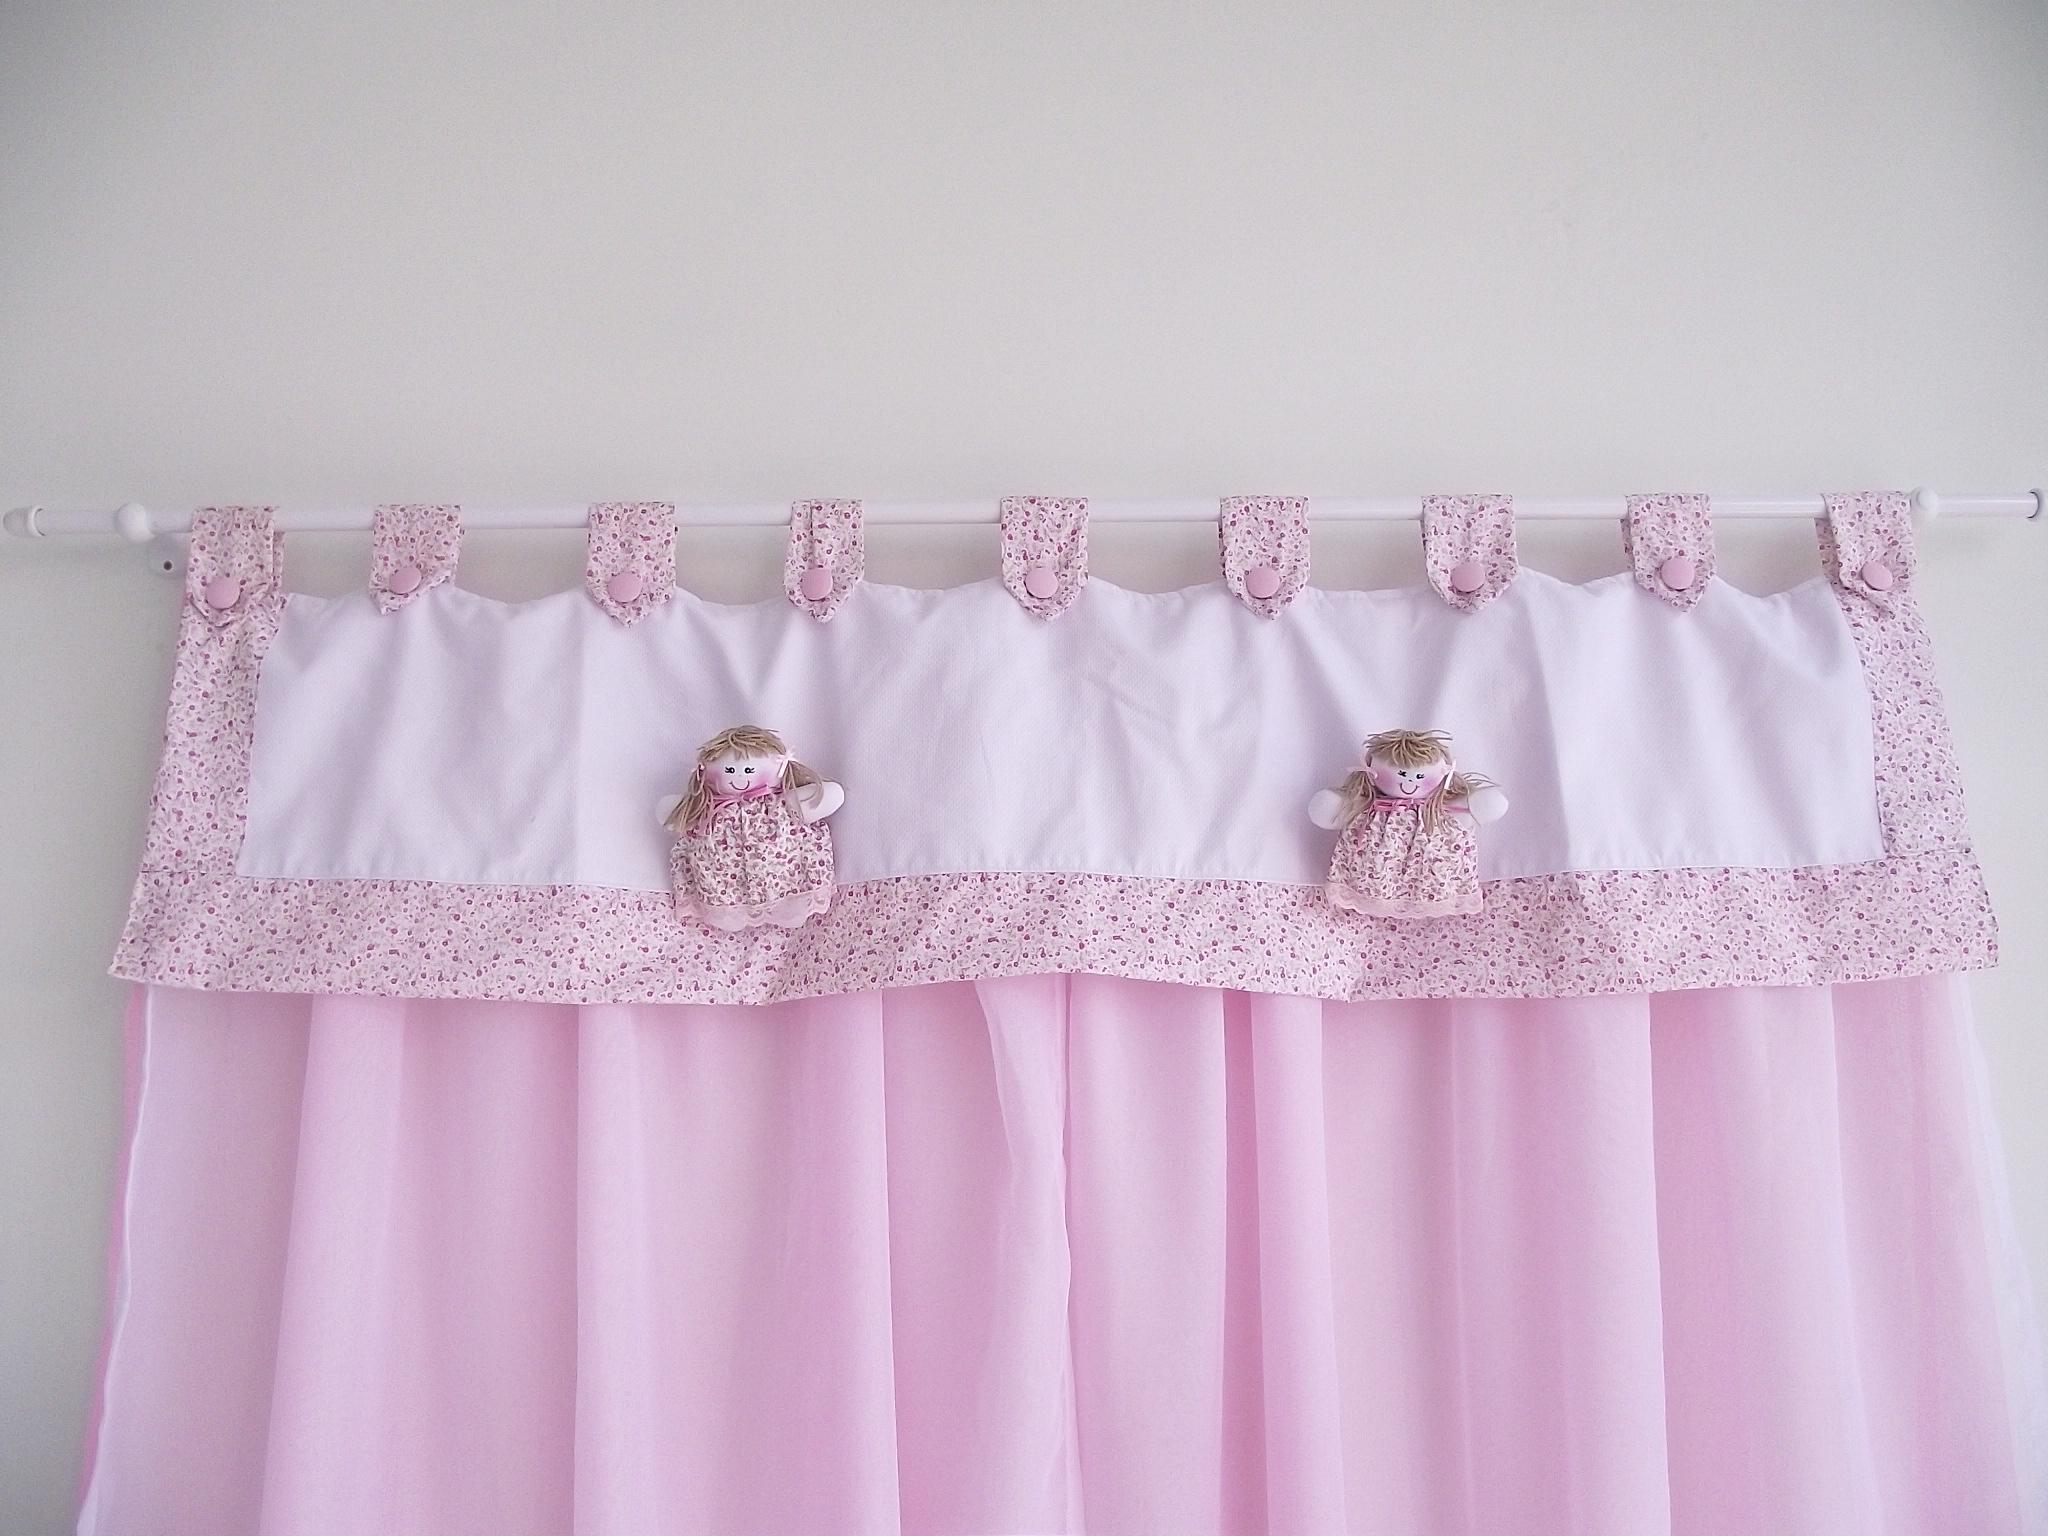 Cortina para quarto de bebe onde comprar - Comprar cortinas barcelona ...